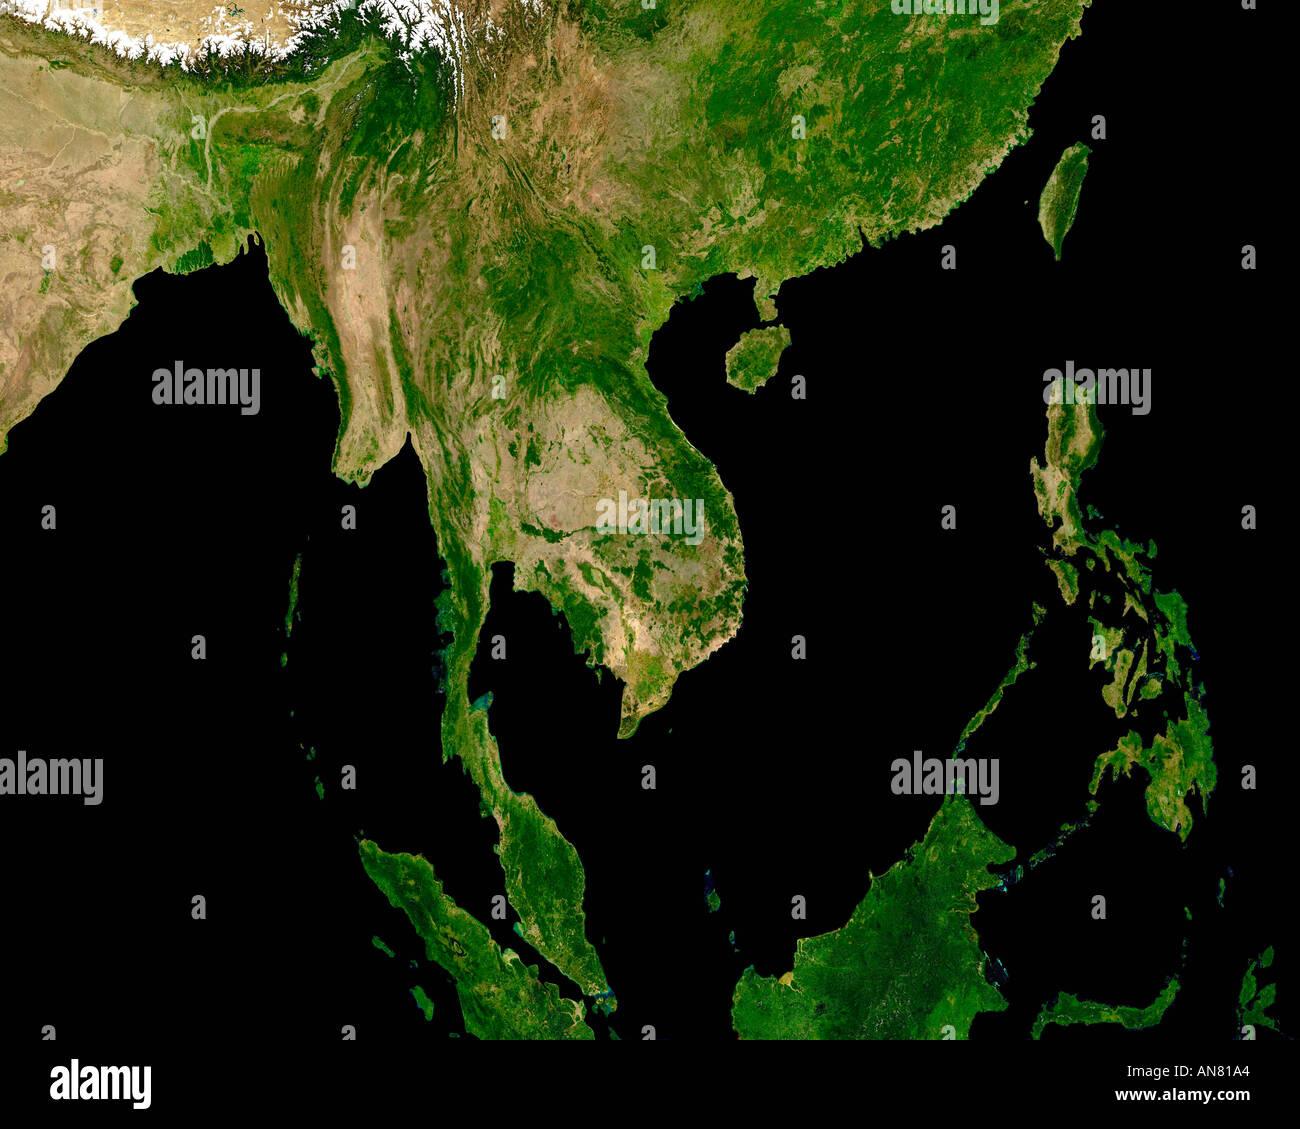 South East Asia A Satellite View Vietnam Cambodia Laos Etc Stock - Asia satellite map